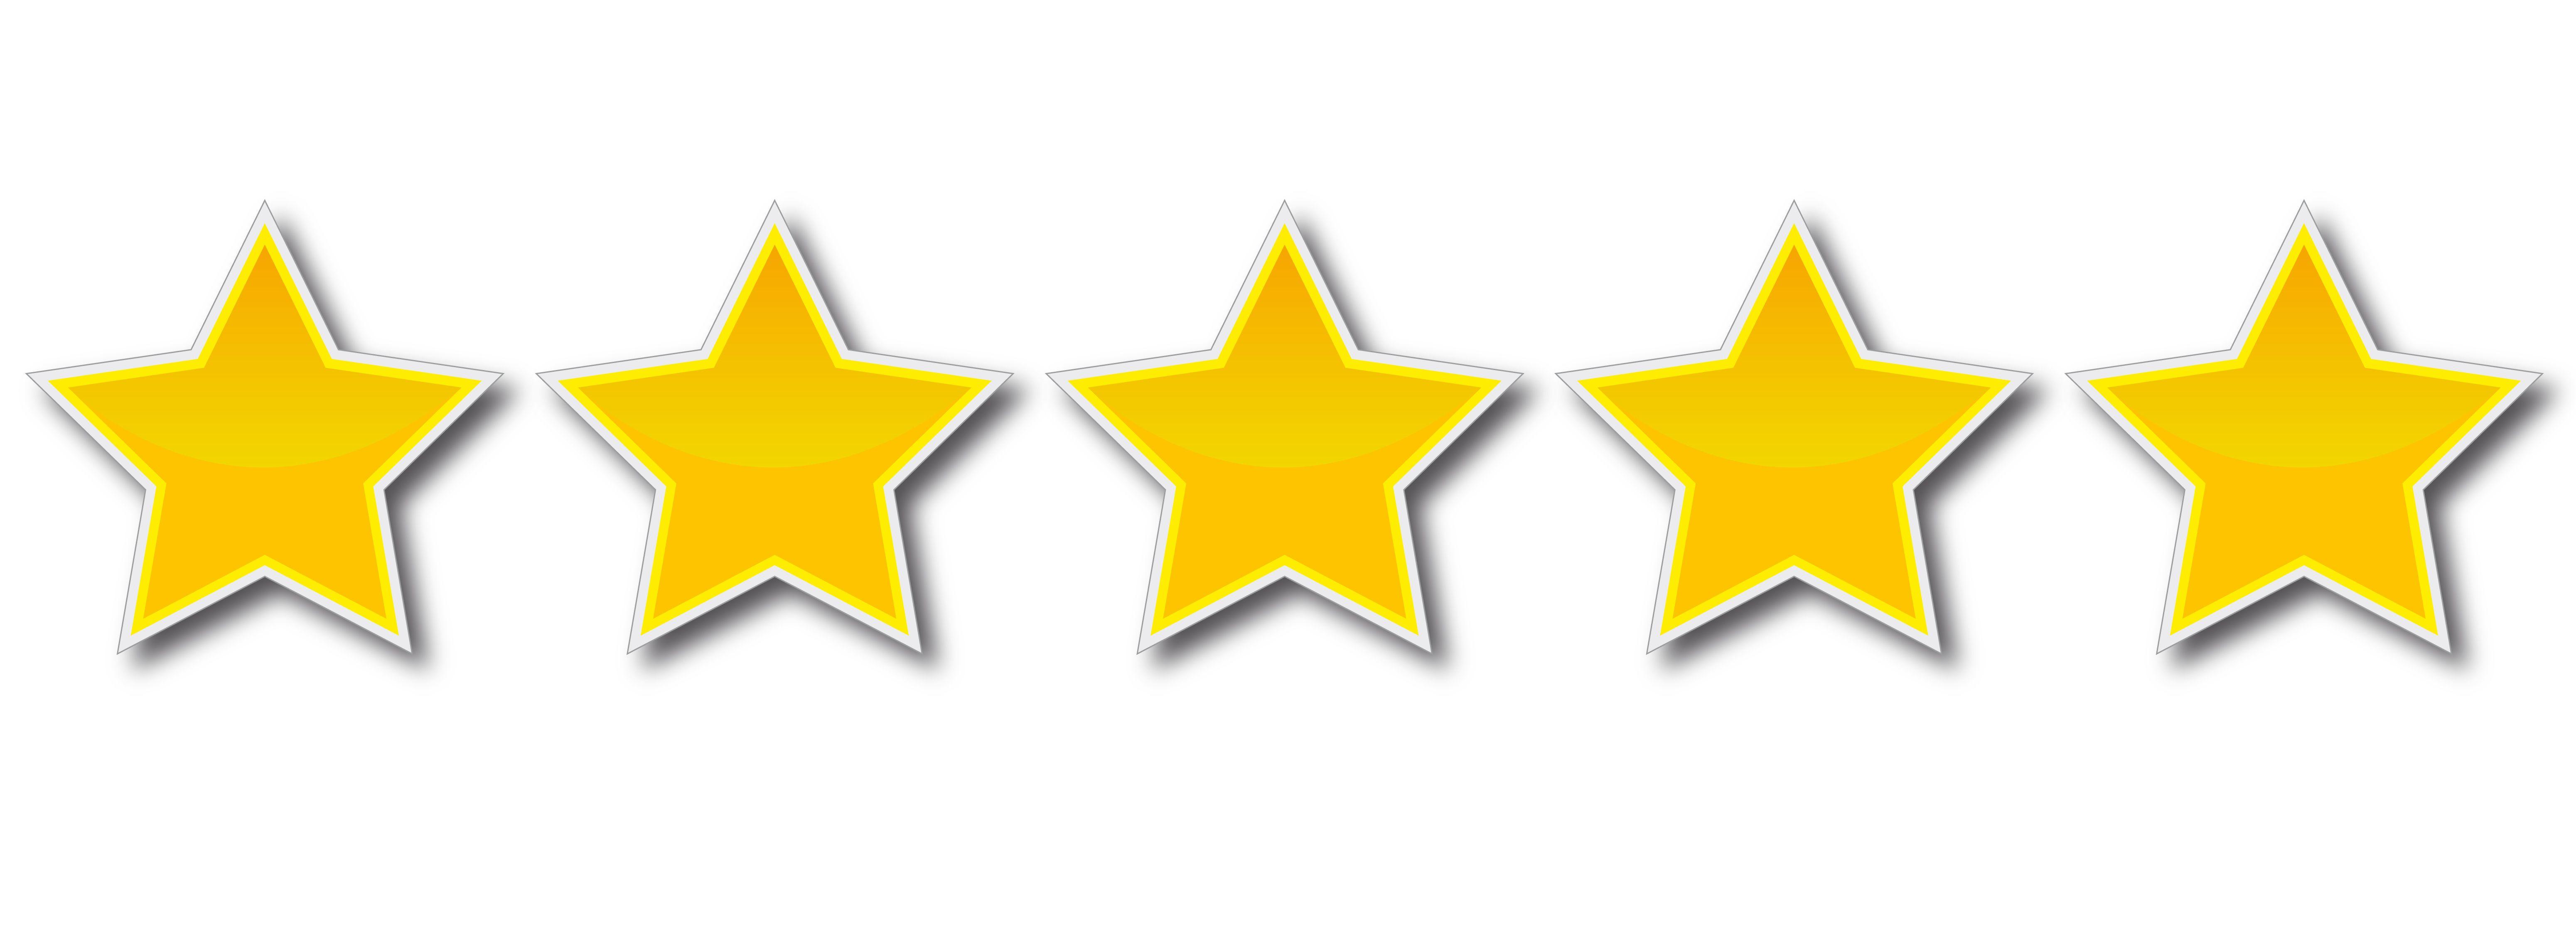 5 STAR Reviews for WriteBrain on Bitte keine